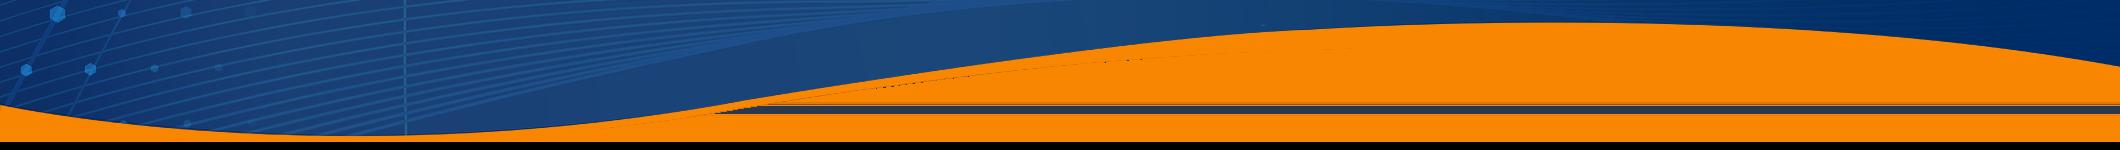 IBIS-AMI (Algorithmic Modeling Interface) Model Simulation